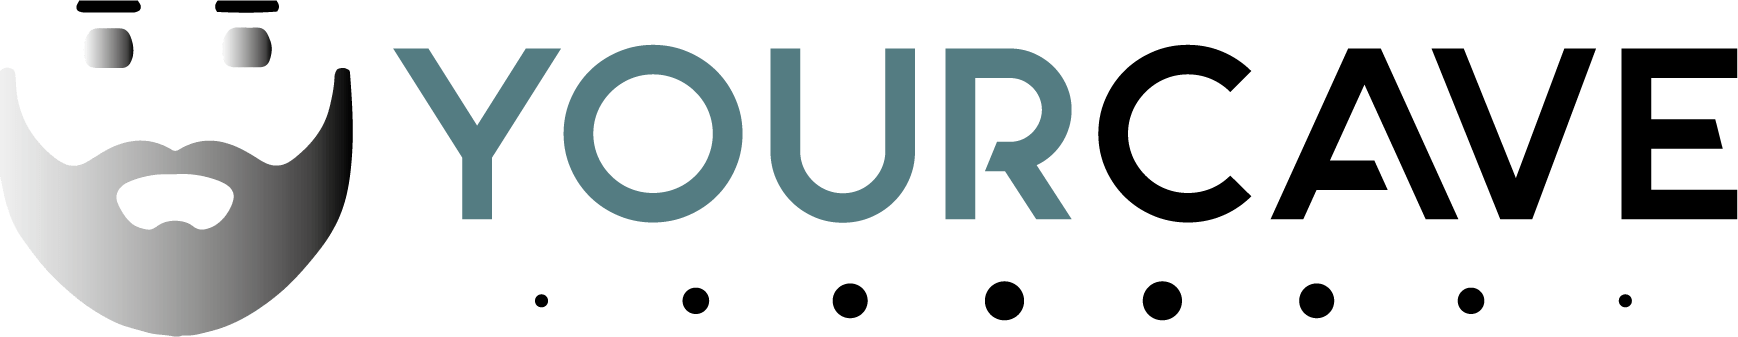 Desktop logo transparant_Tekengebied 1